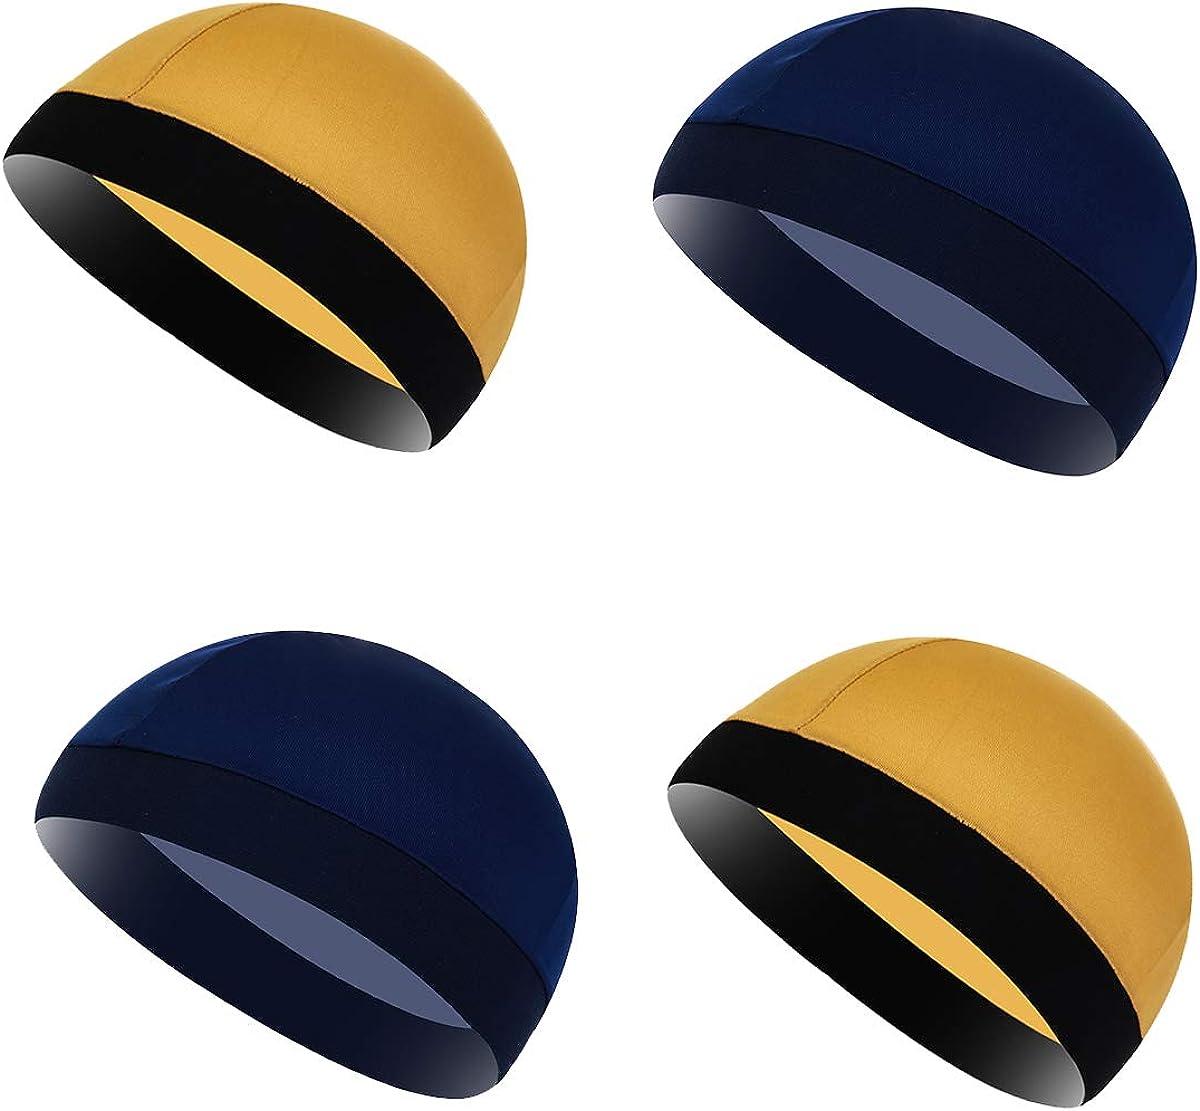 Shark Tooth Cooling Helmet Liner for Men & Women Cycling Skull Cap Running Hat